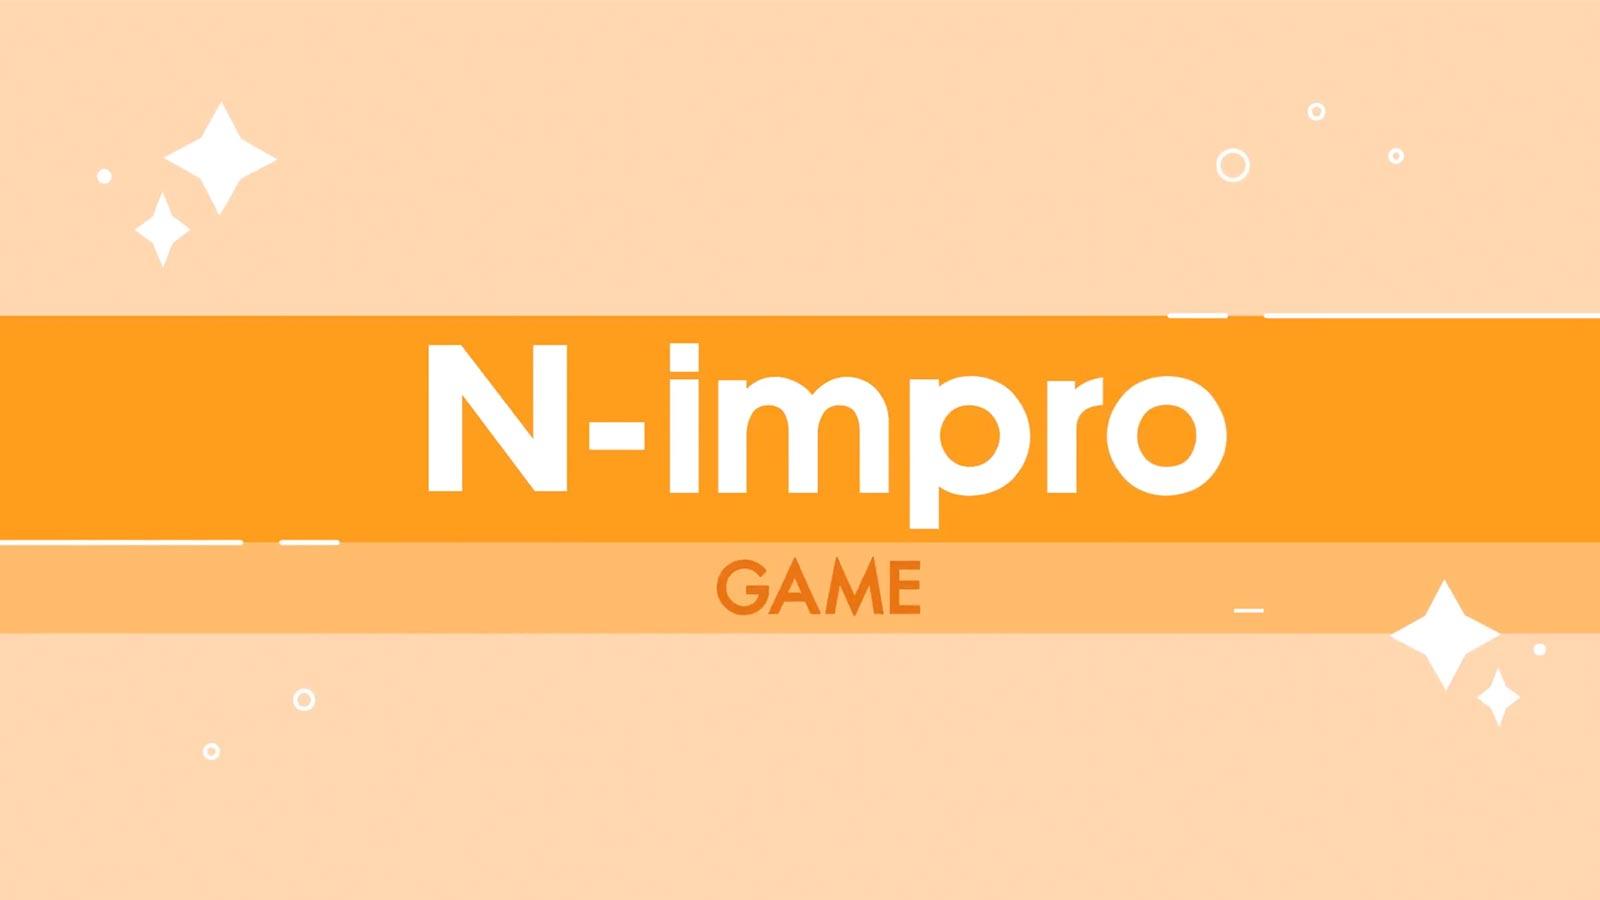 N-impro